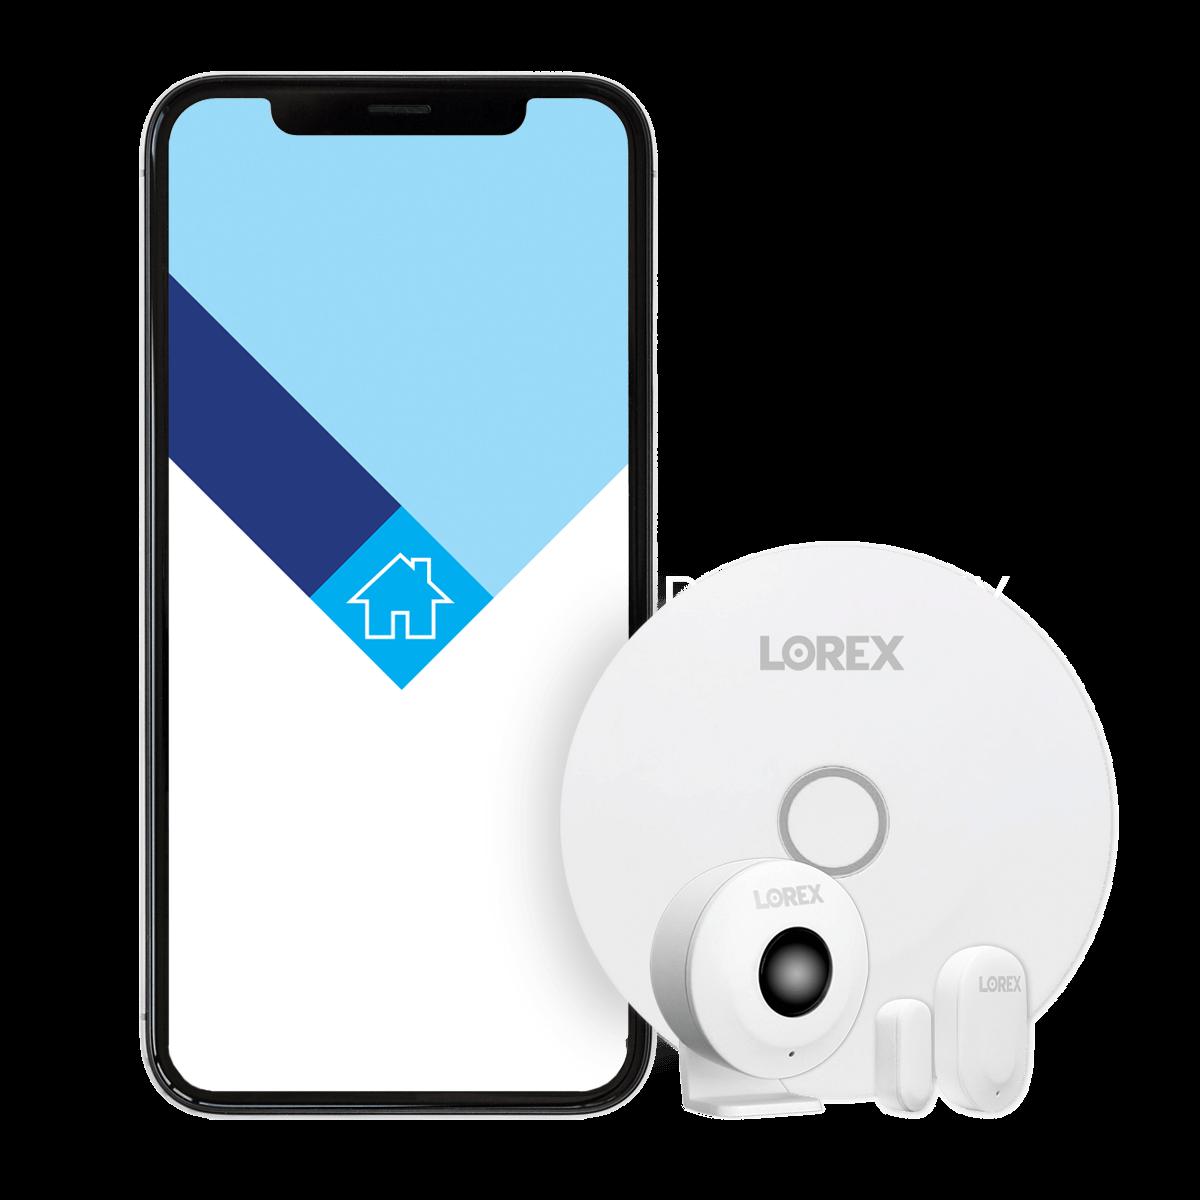 Lorex Sensor Kit and Lorex Home App